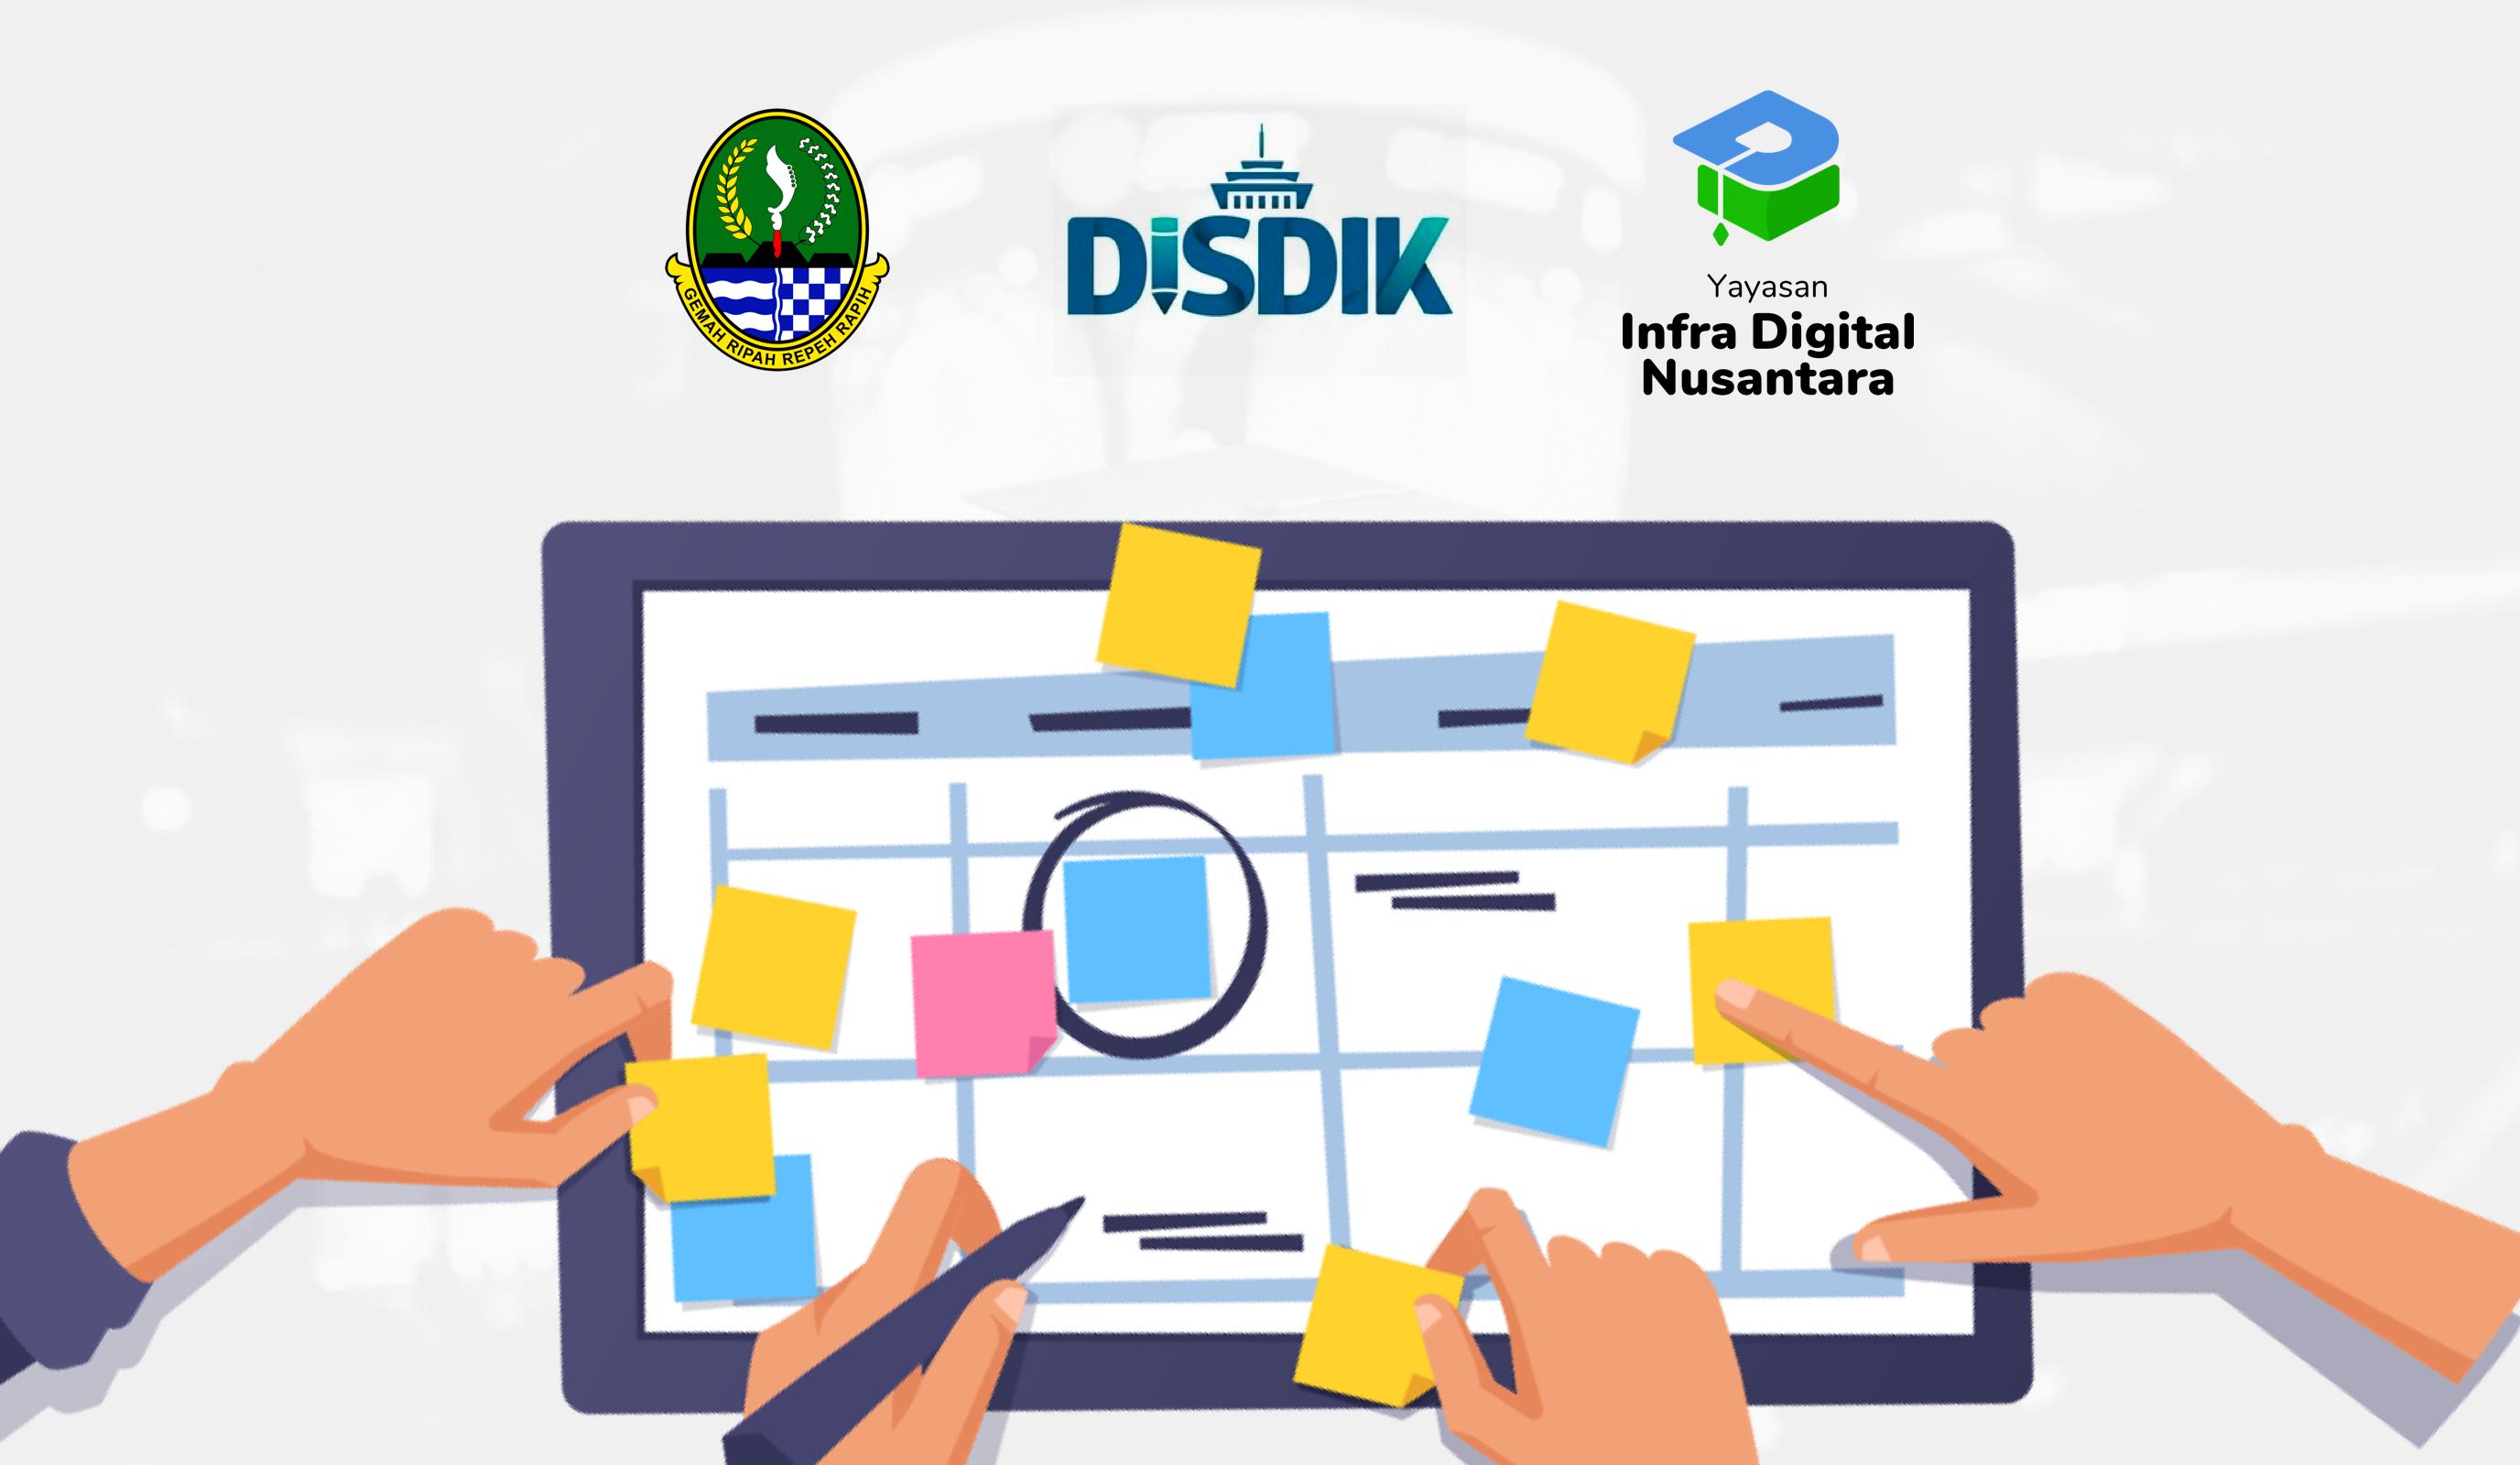 Kelola Dana CSR Pendidikan, Pemerintah Daerah Provinsi Jawa Barat Gandeng Yayasan InfraDigital Nusantara dalam Program CSR HUB